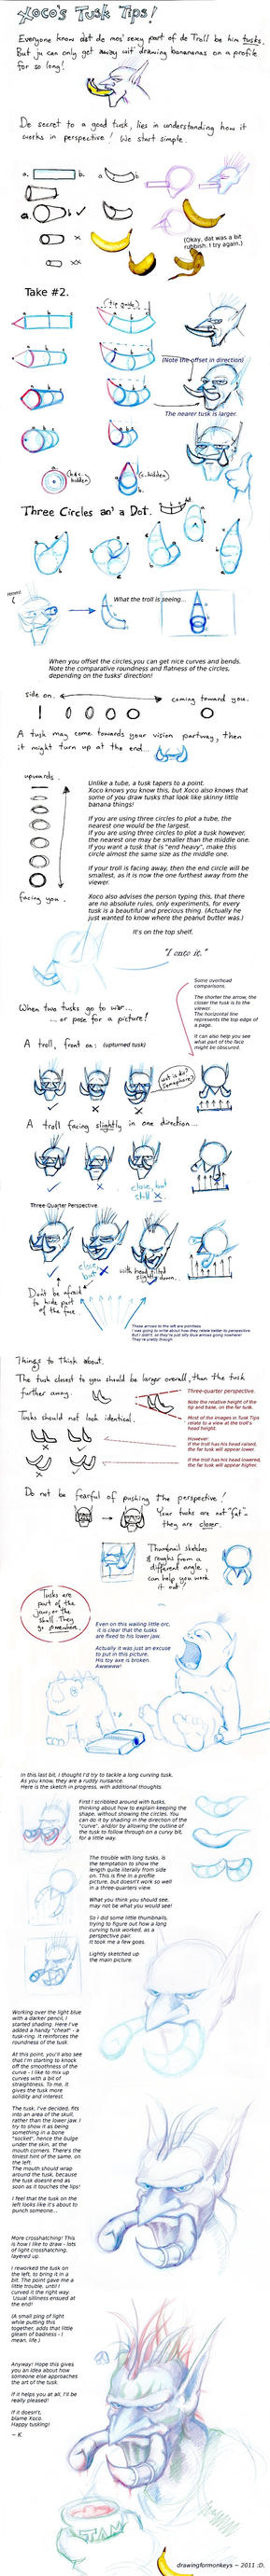 Tusk Tips by DrawingForMonkeys